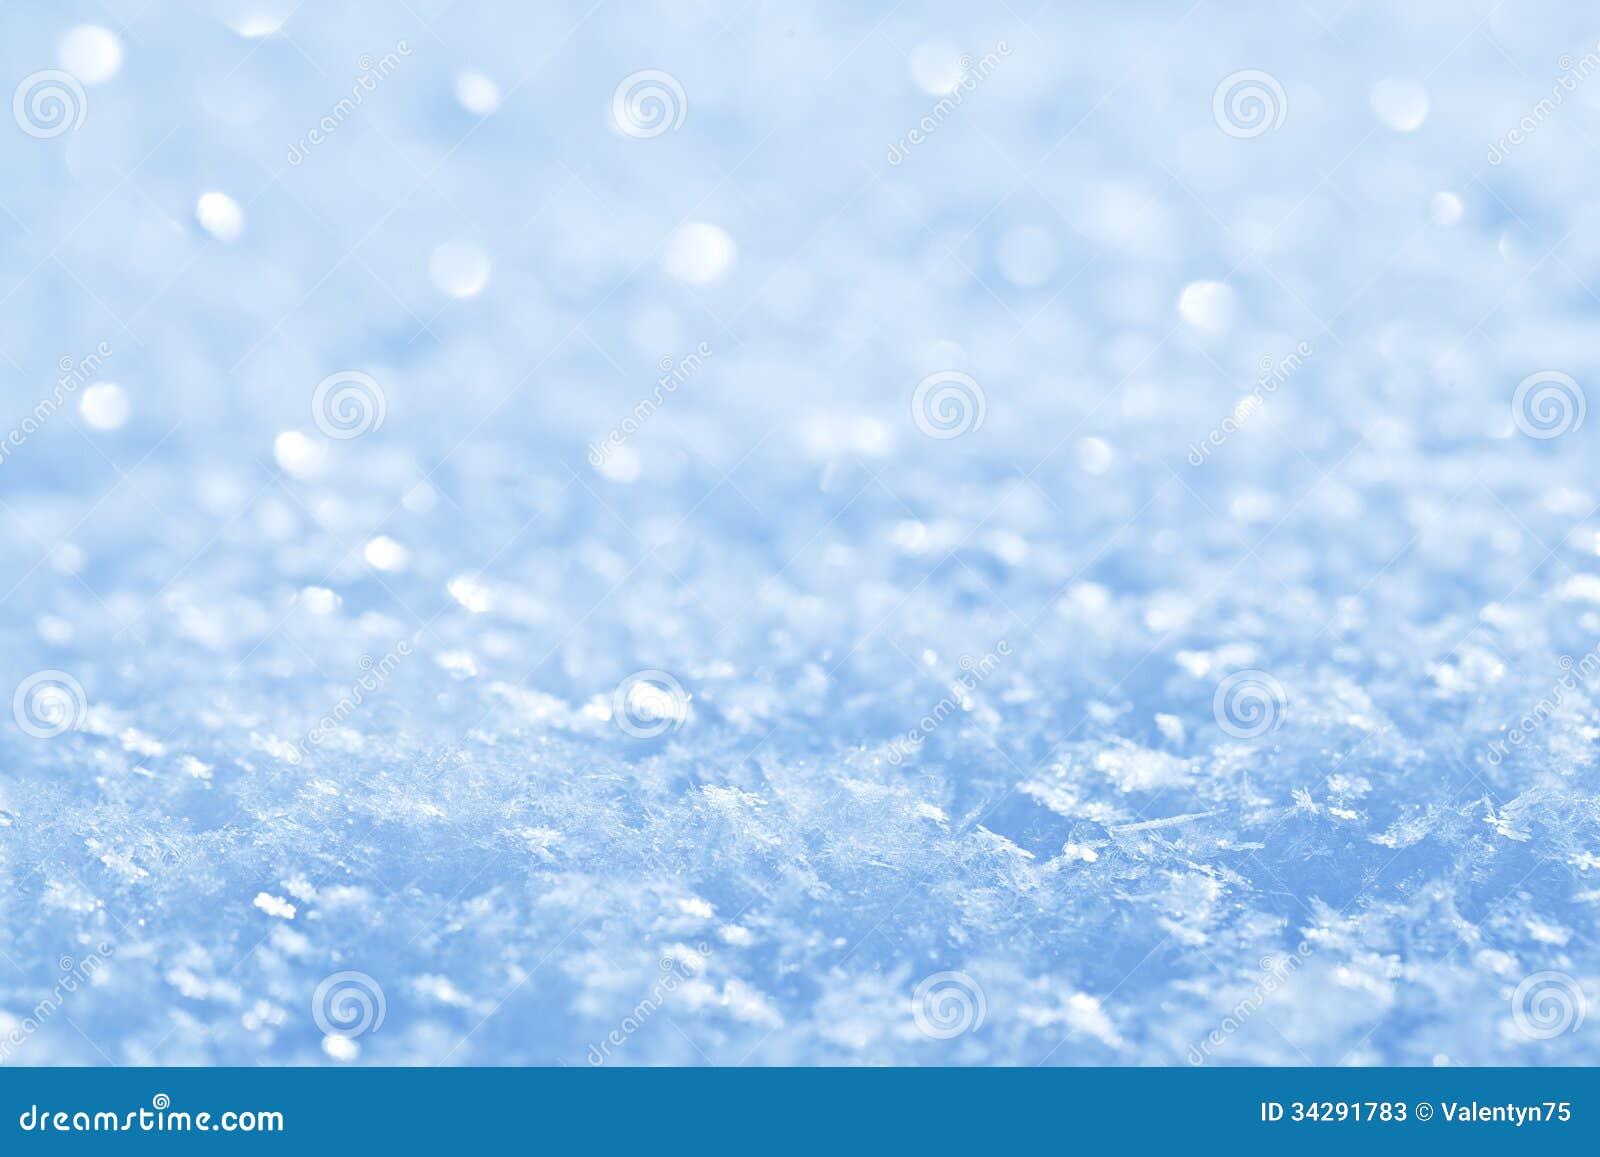 sparkling snow desktop wallpaper - photo #6